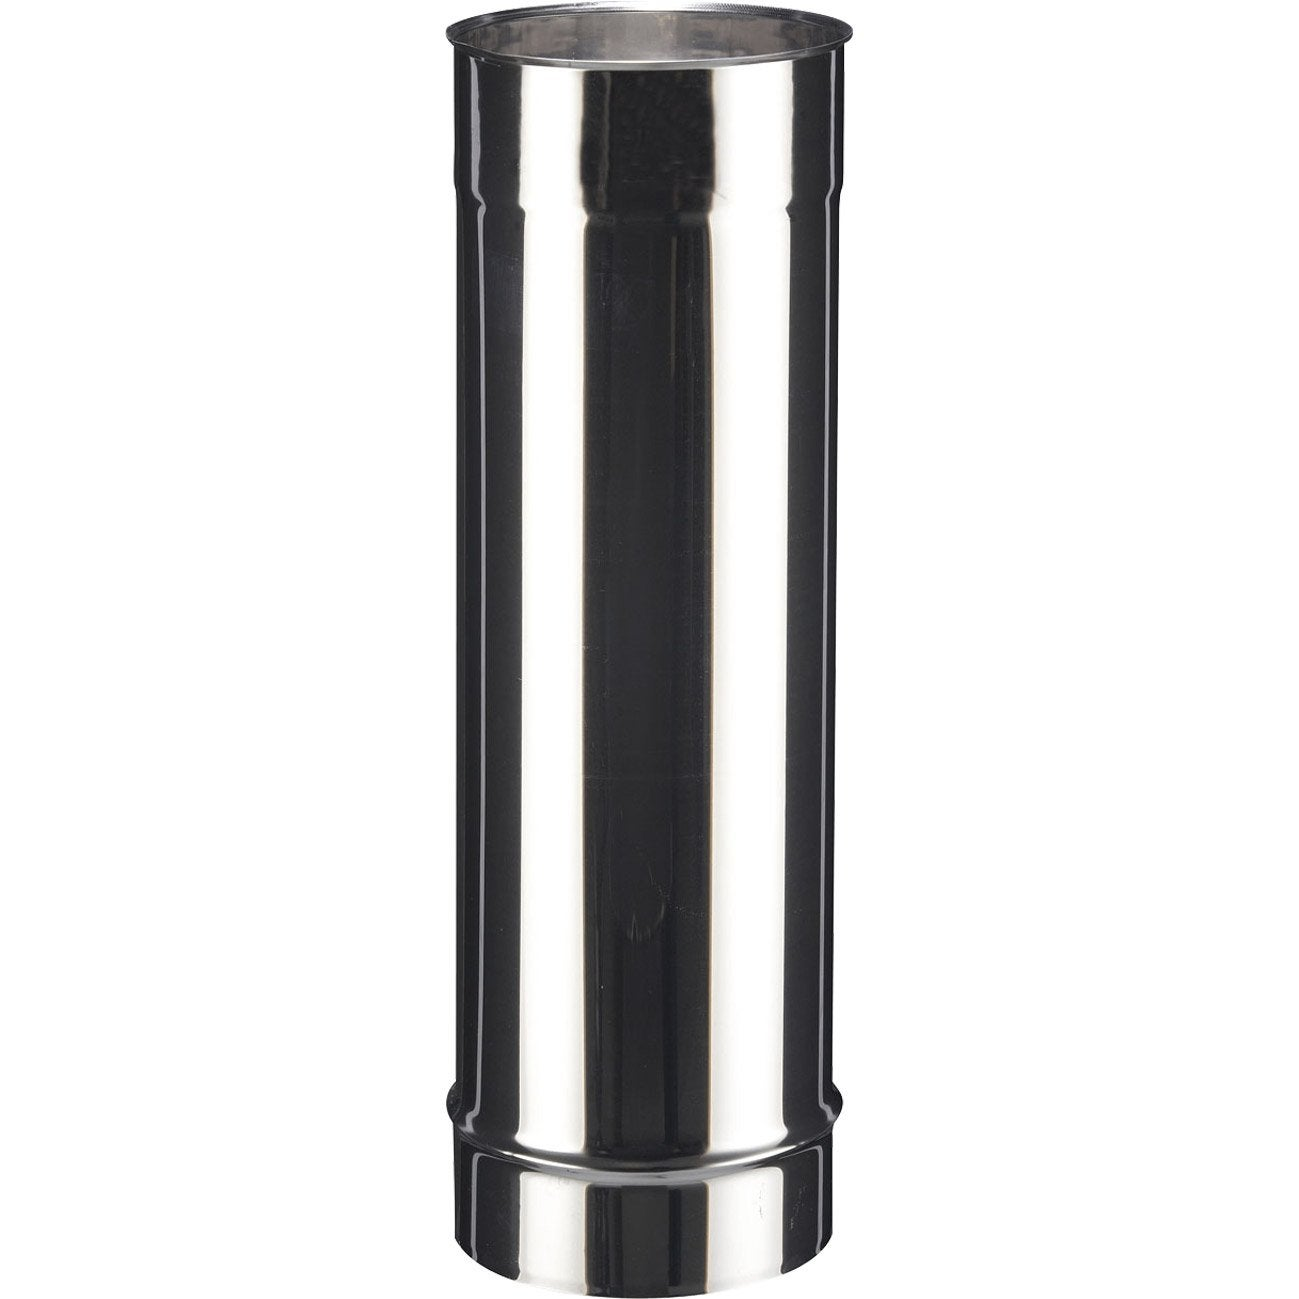 tuyau inox de raccordement poujoulat diam 180 mm 50 cm leroy merlin. Black Bedroom Furniture Sets. Home Design Ideas